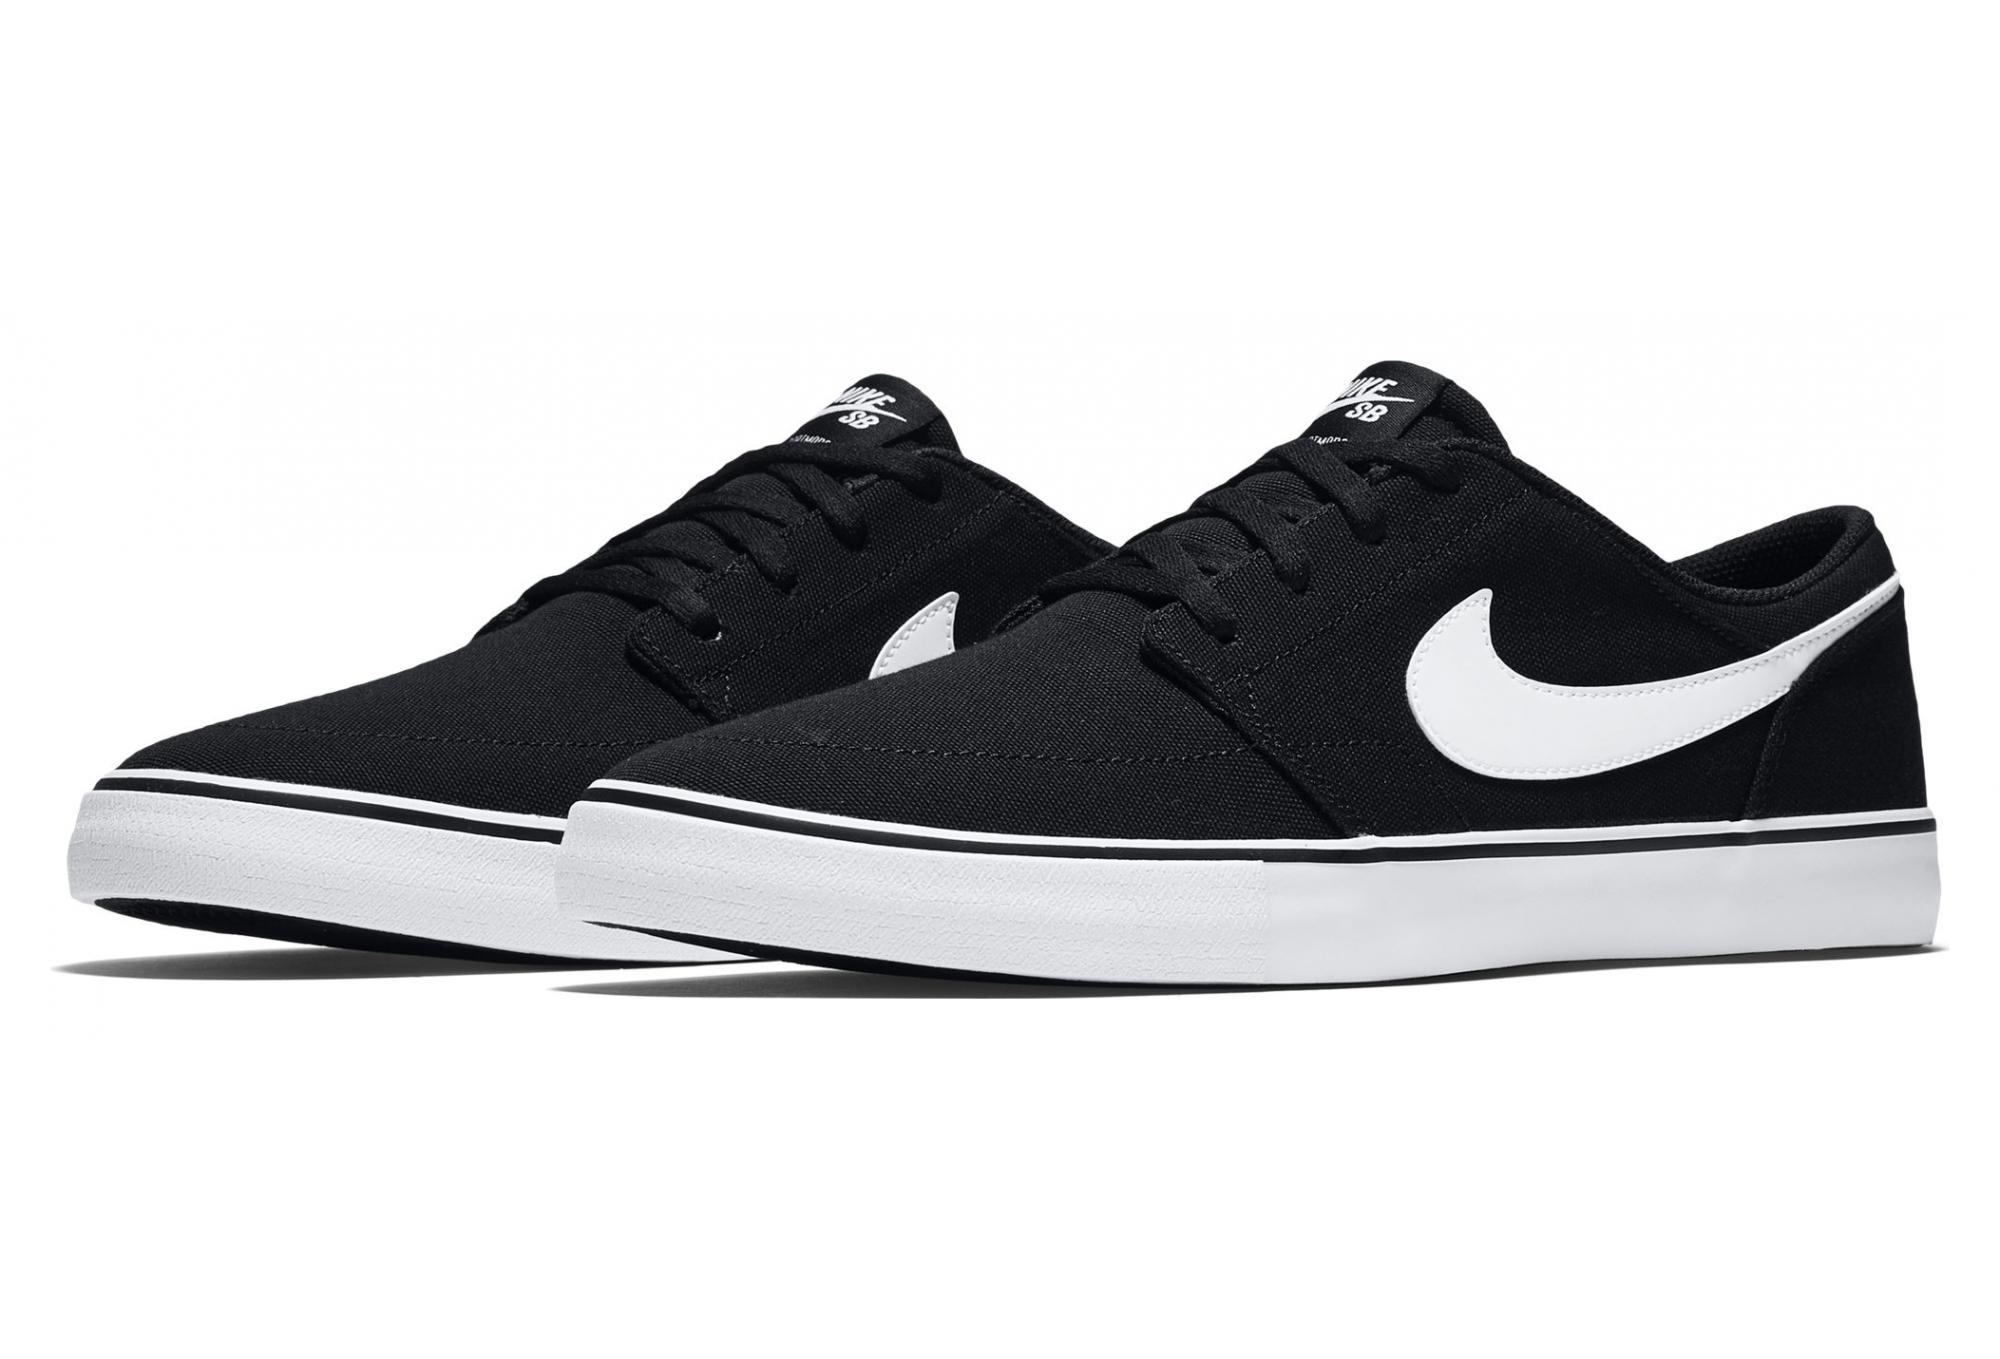 Nike SB Solarsoft Portmore II Shoes Black White